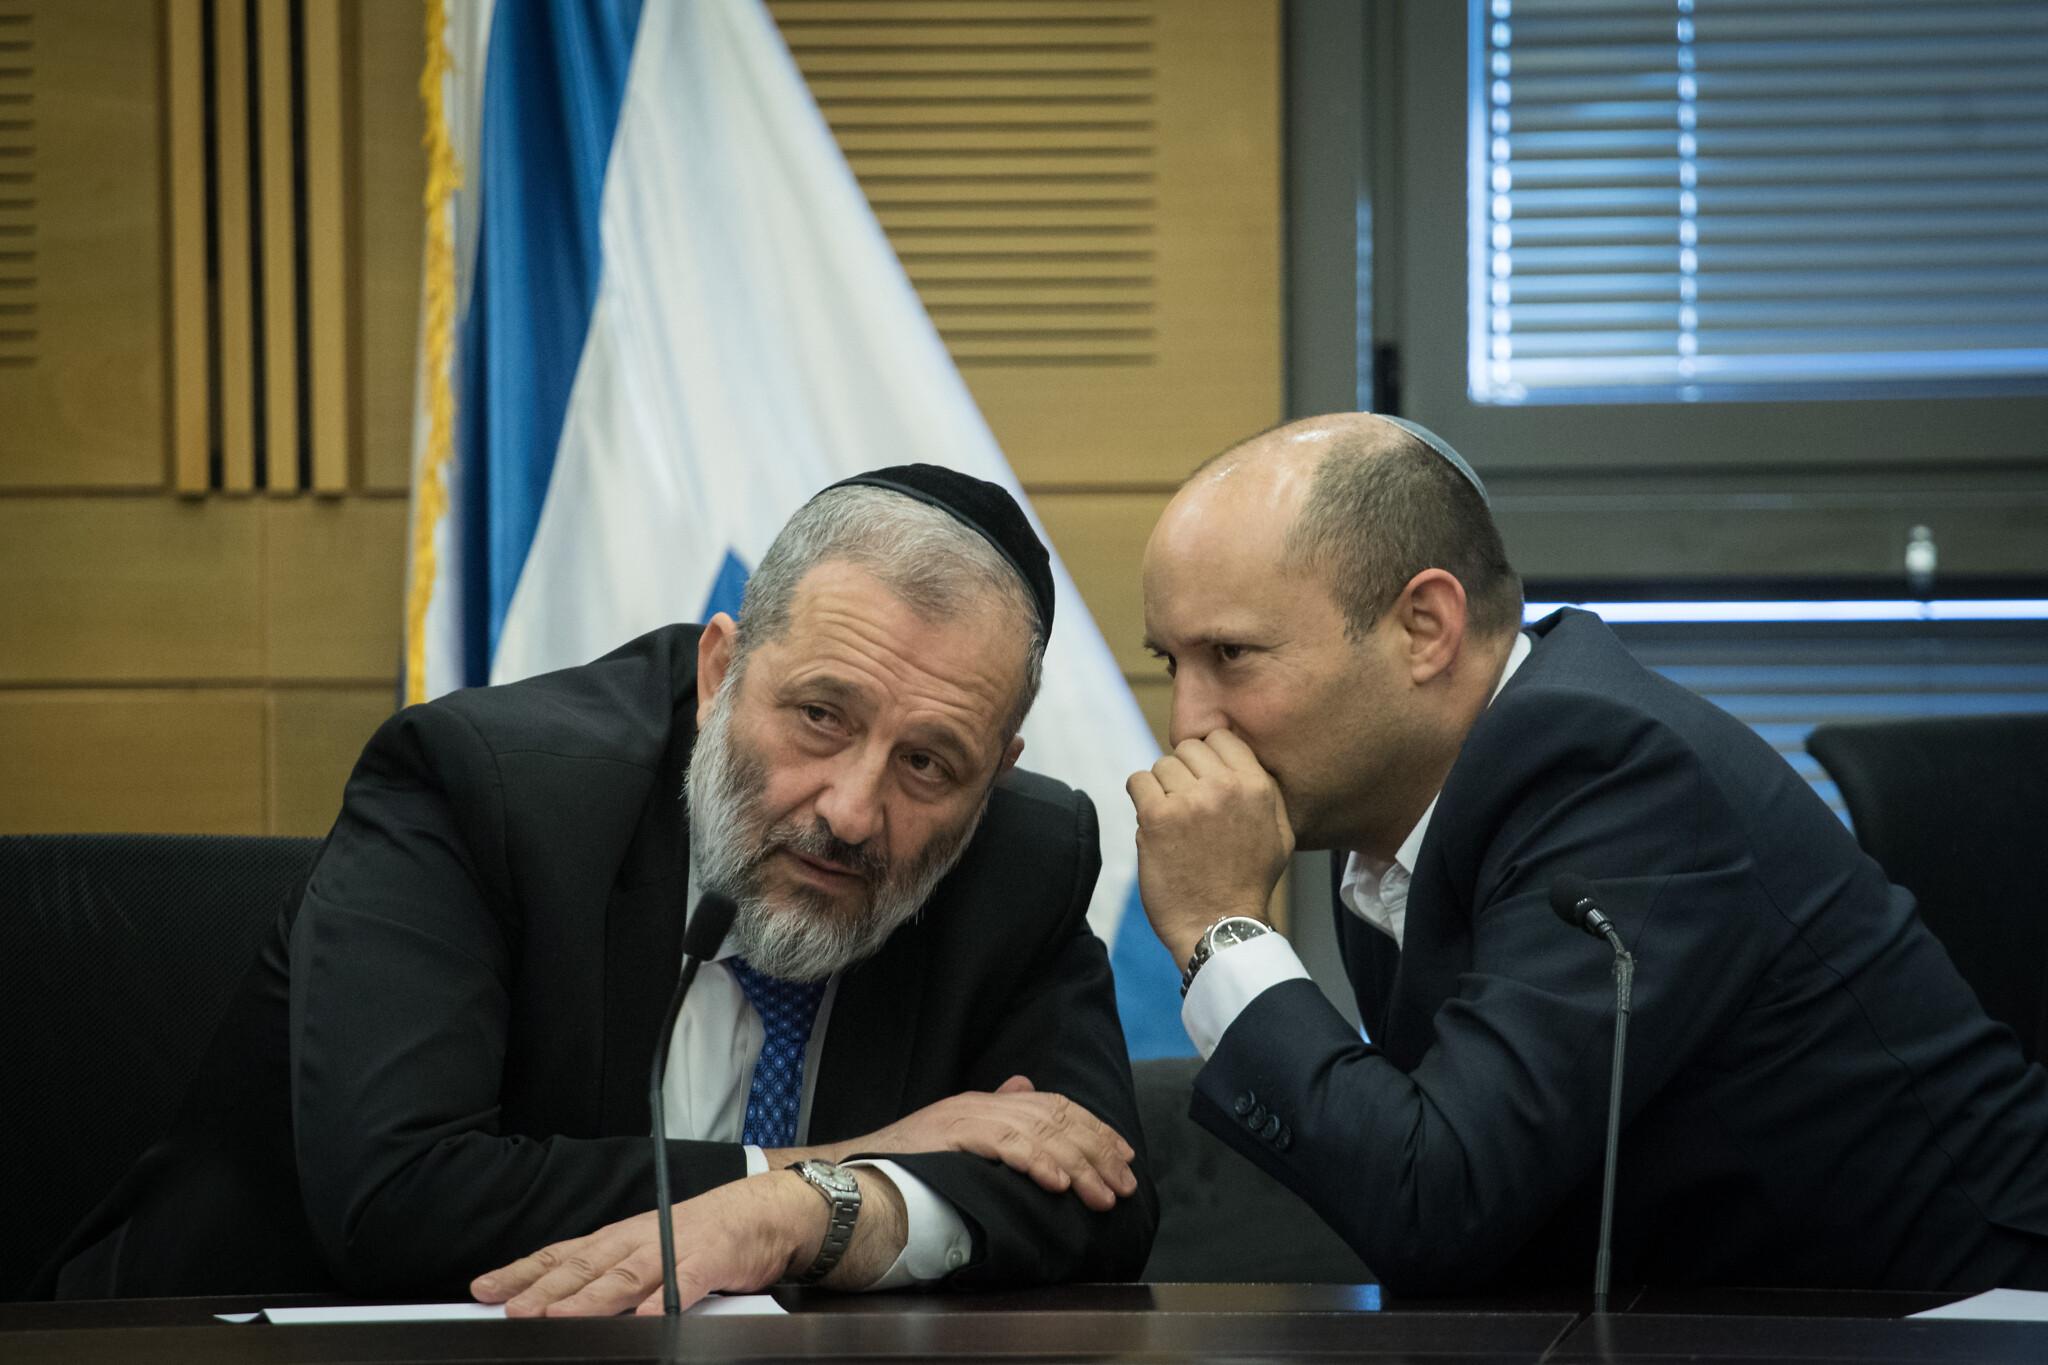 United Nations names global companies linked to Israeli settlements